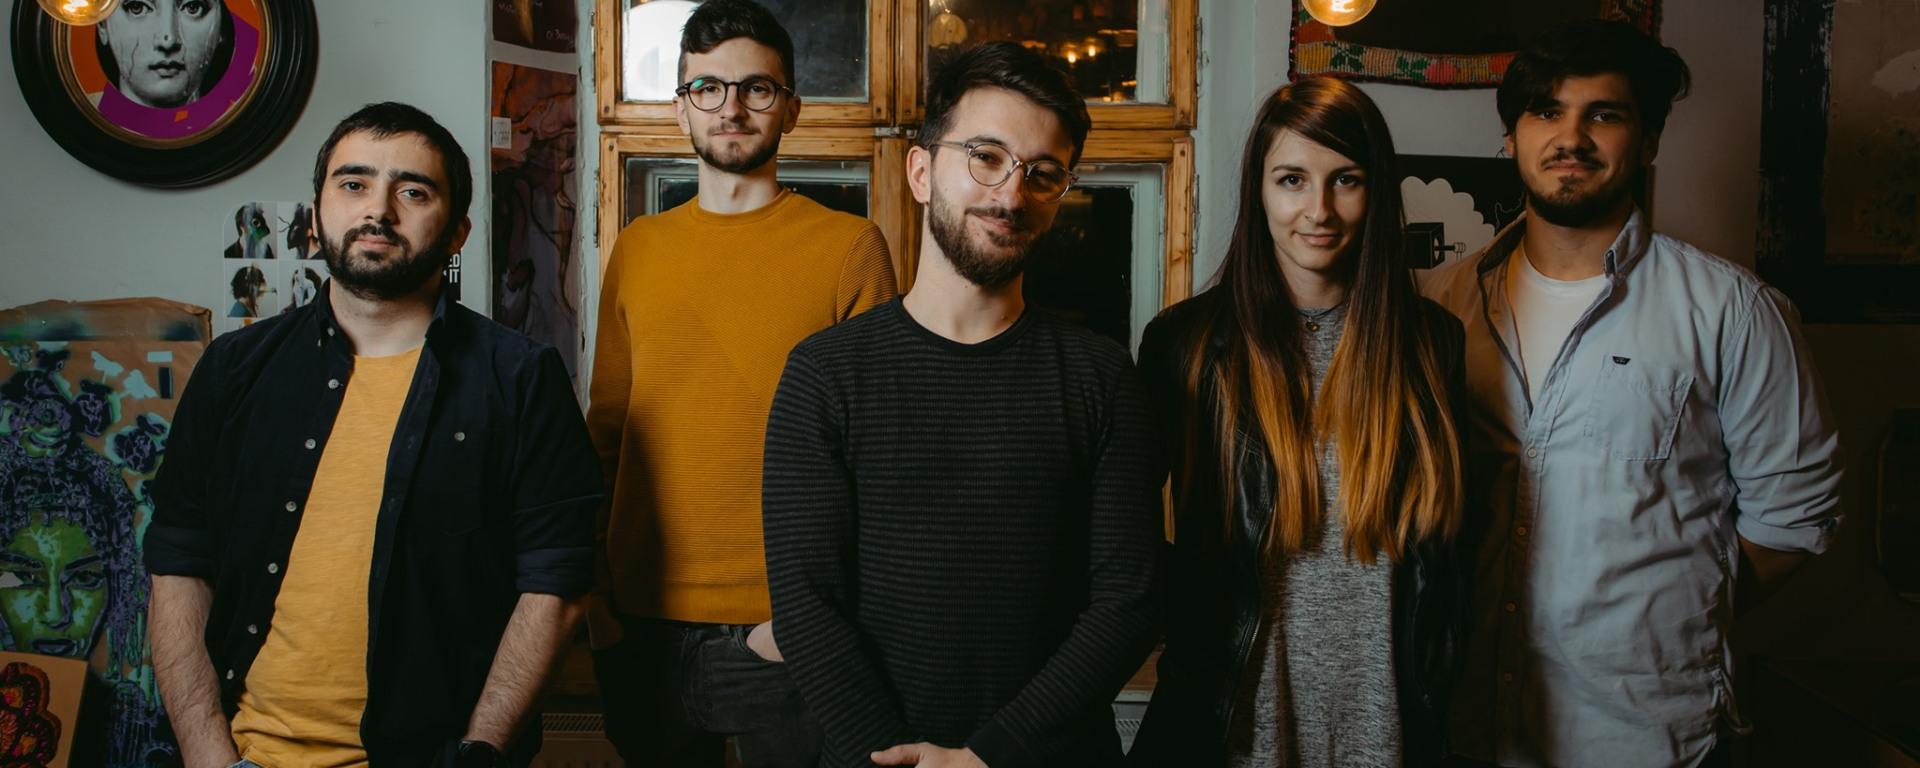 "Alexu and The Voices Inside a lansat clipul live pentru piesa ""Boulevards of Promises"""